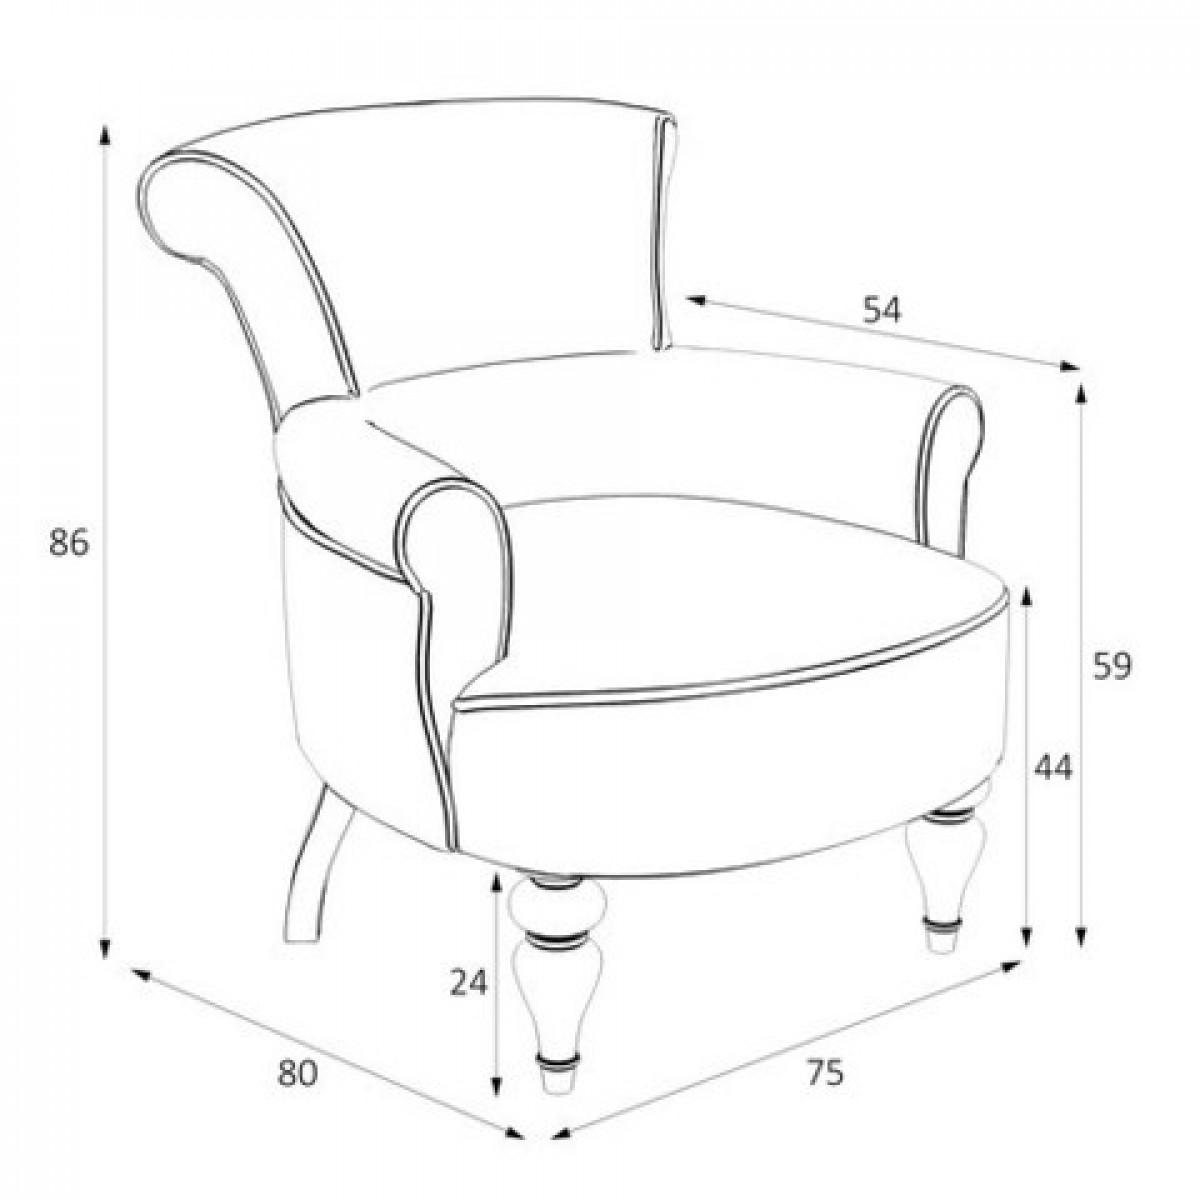 M11-B-0366 Кресло Перфетто коллекция L'Atelier Du Meuble